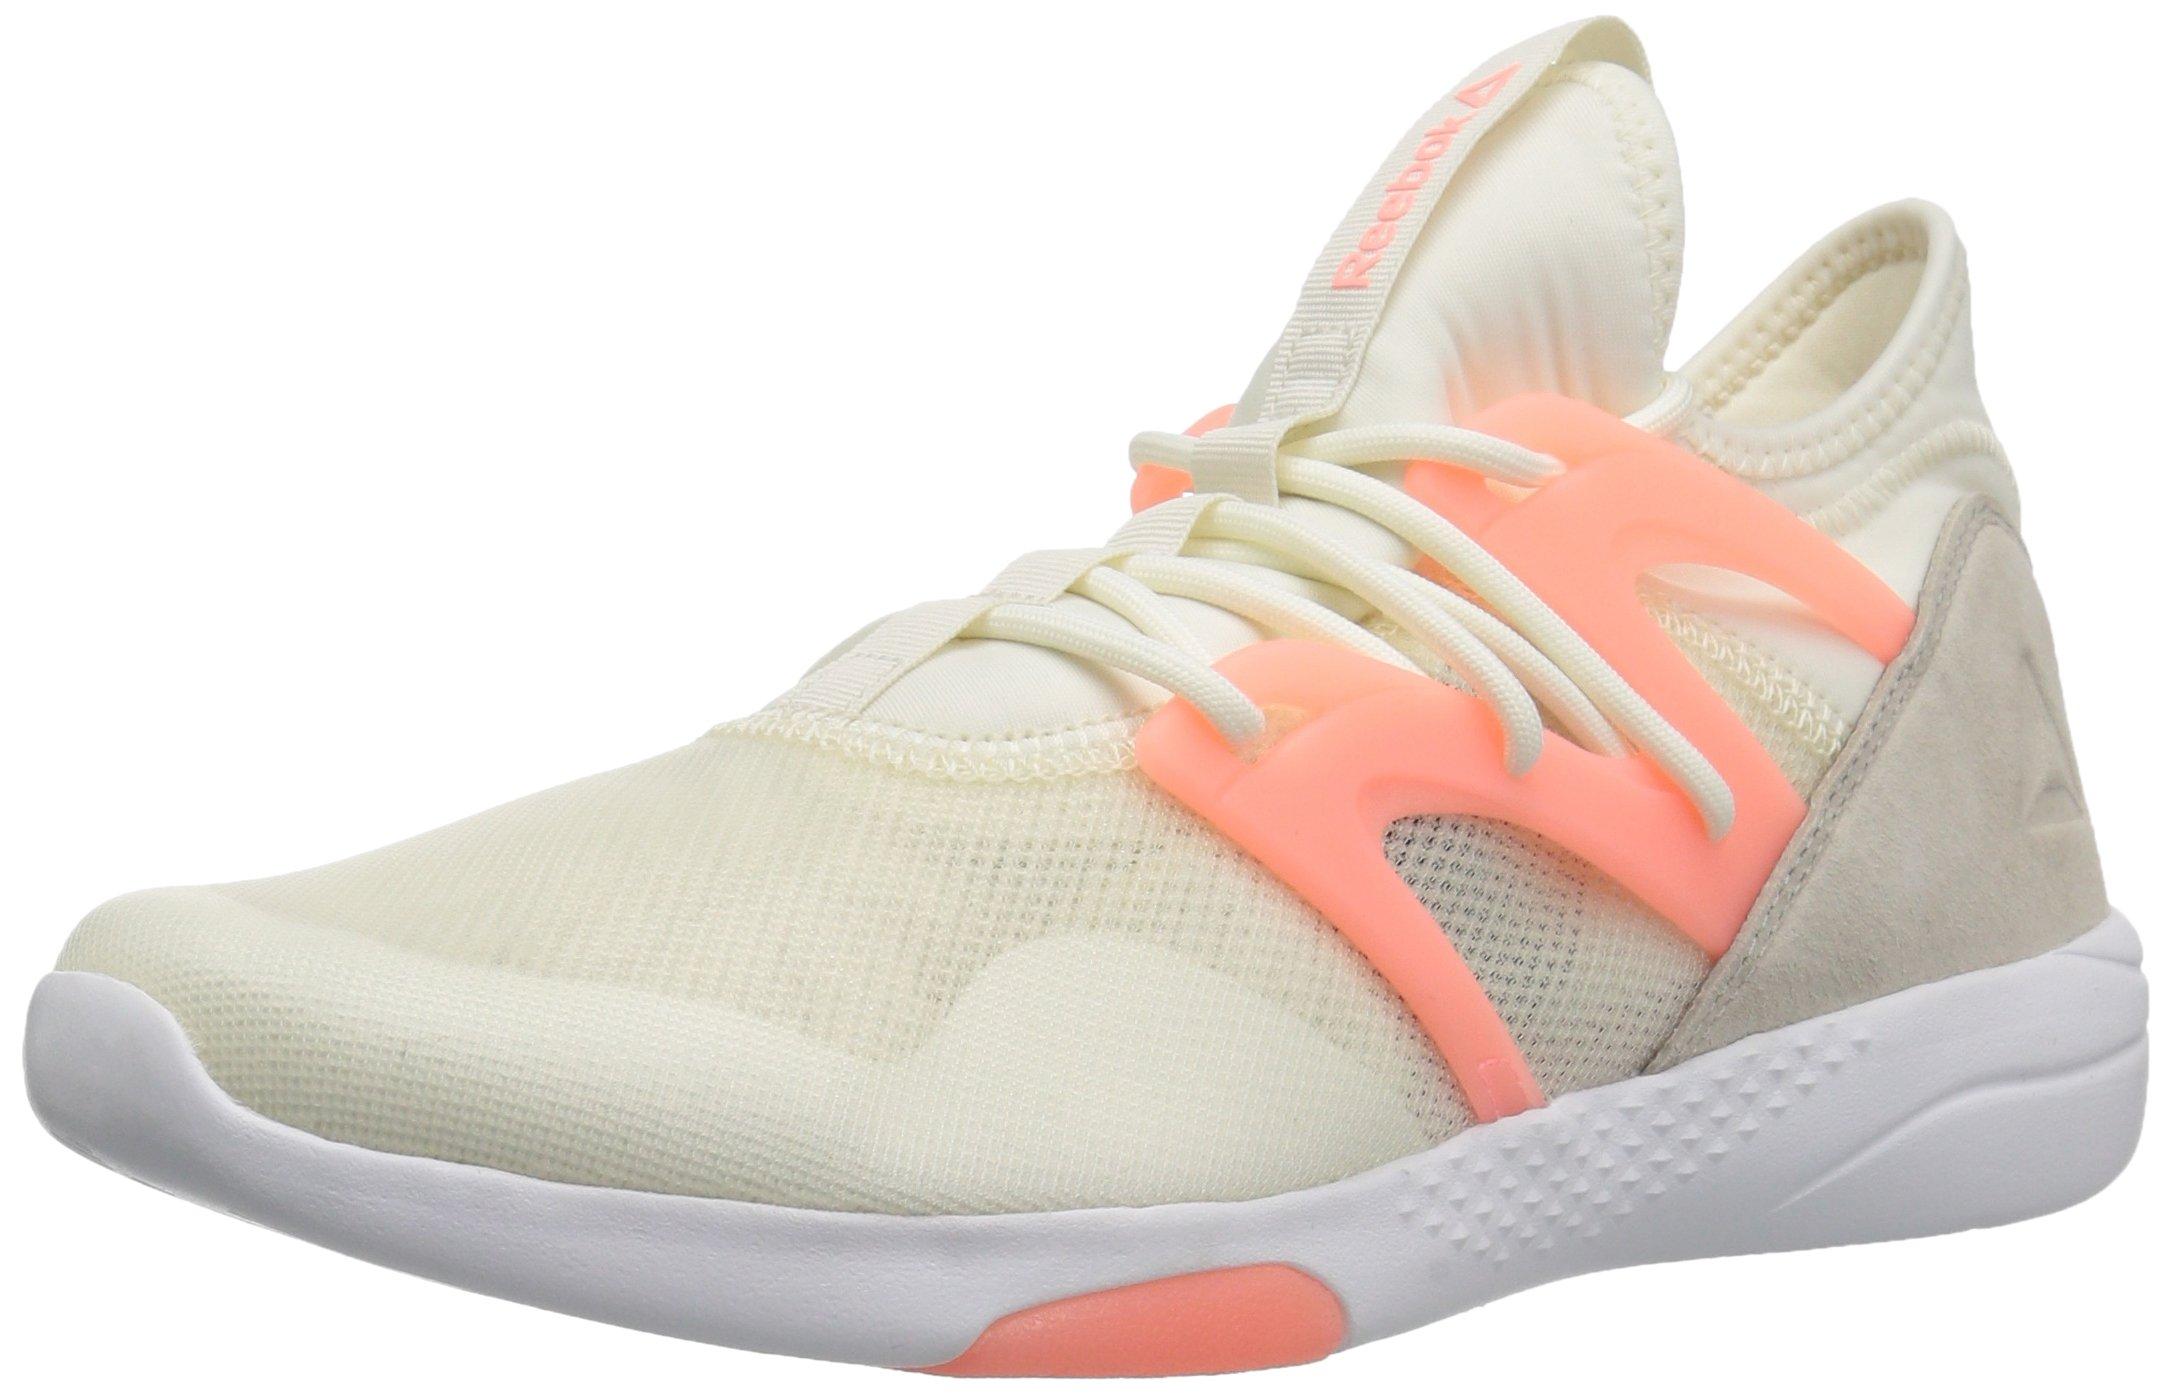 Reebok Women's Hayasu Track Shoe, Chalk/Sand Stone/Sour Melon/White, 8 M US